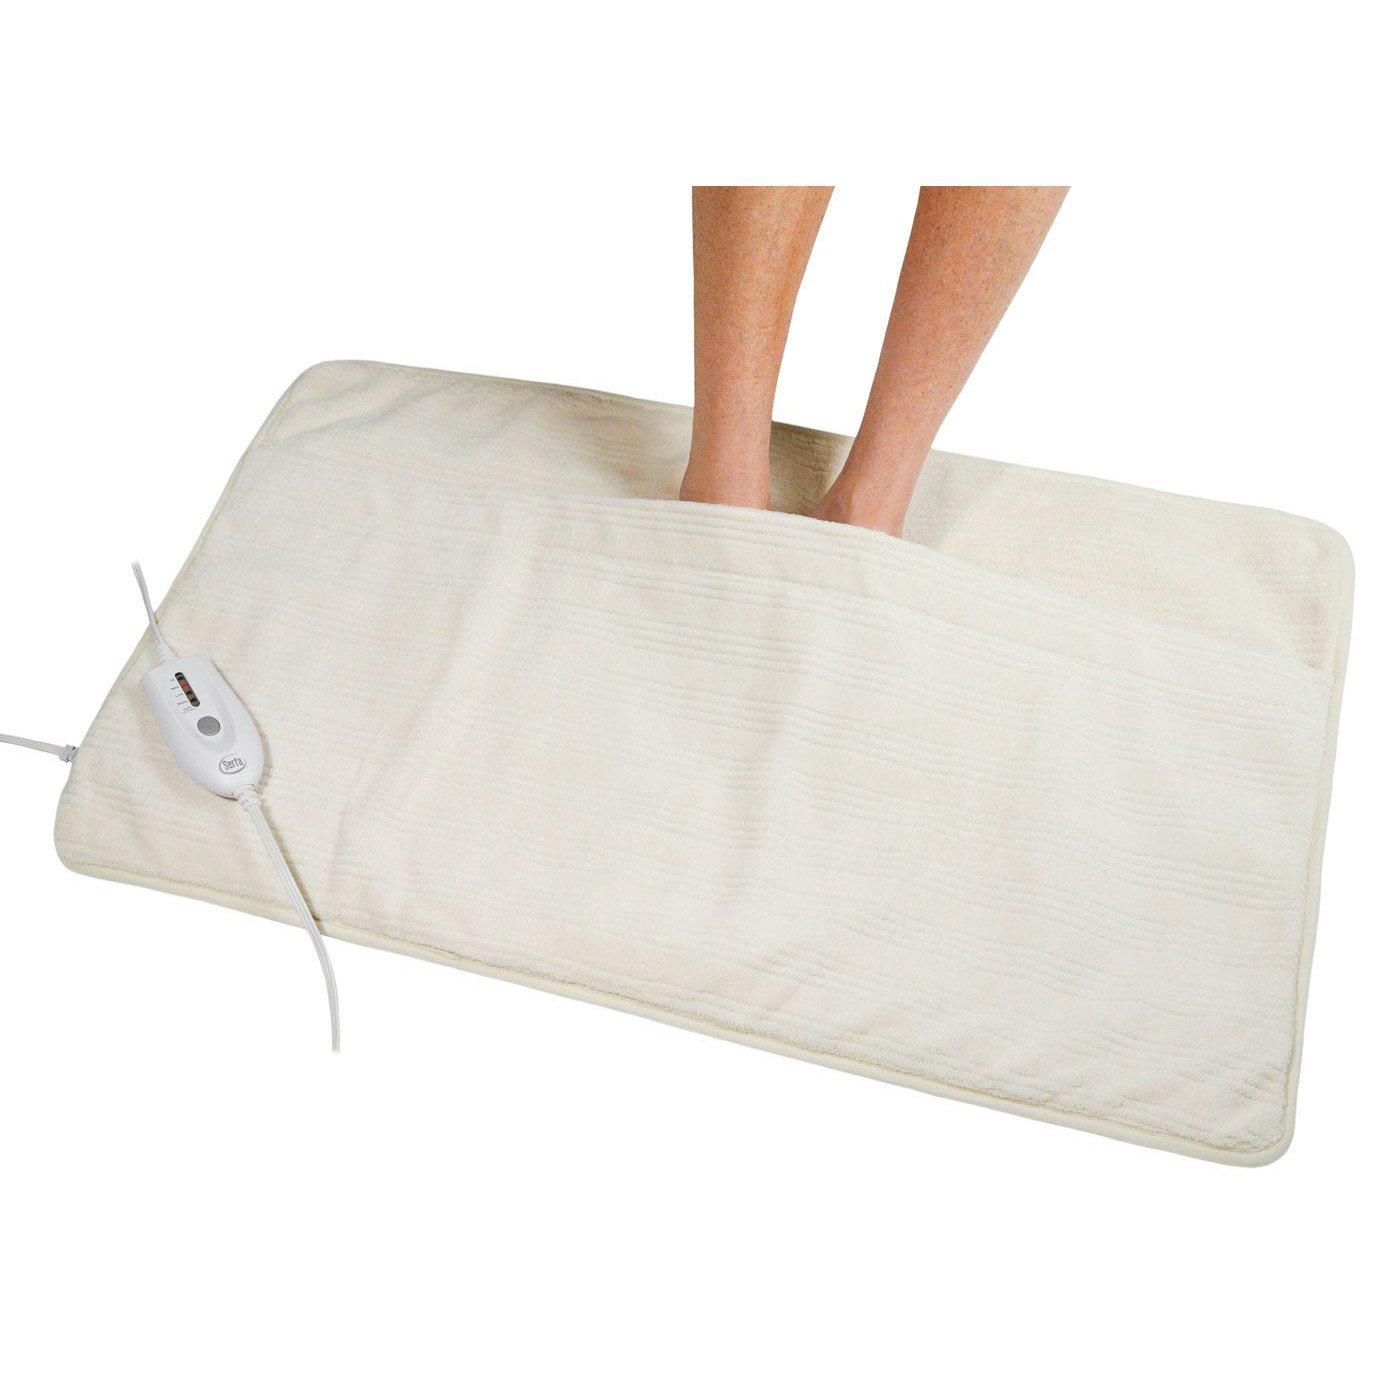 Serta   Ultra Soft Plush Electric Heated Warming Pad for Feet, Back, Waist, and Abdomen, 35x20, Ivory